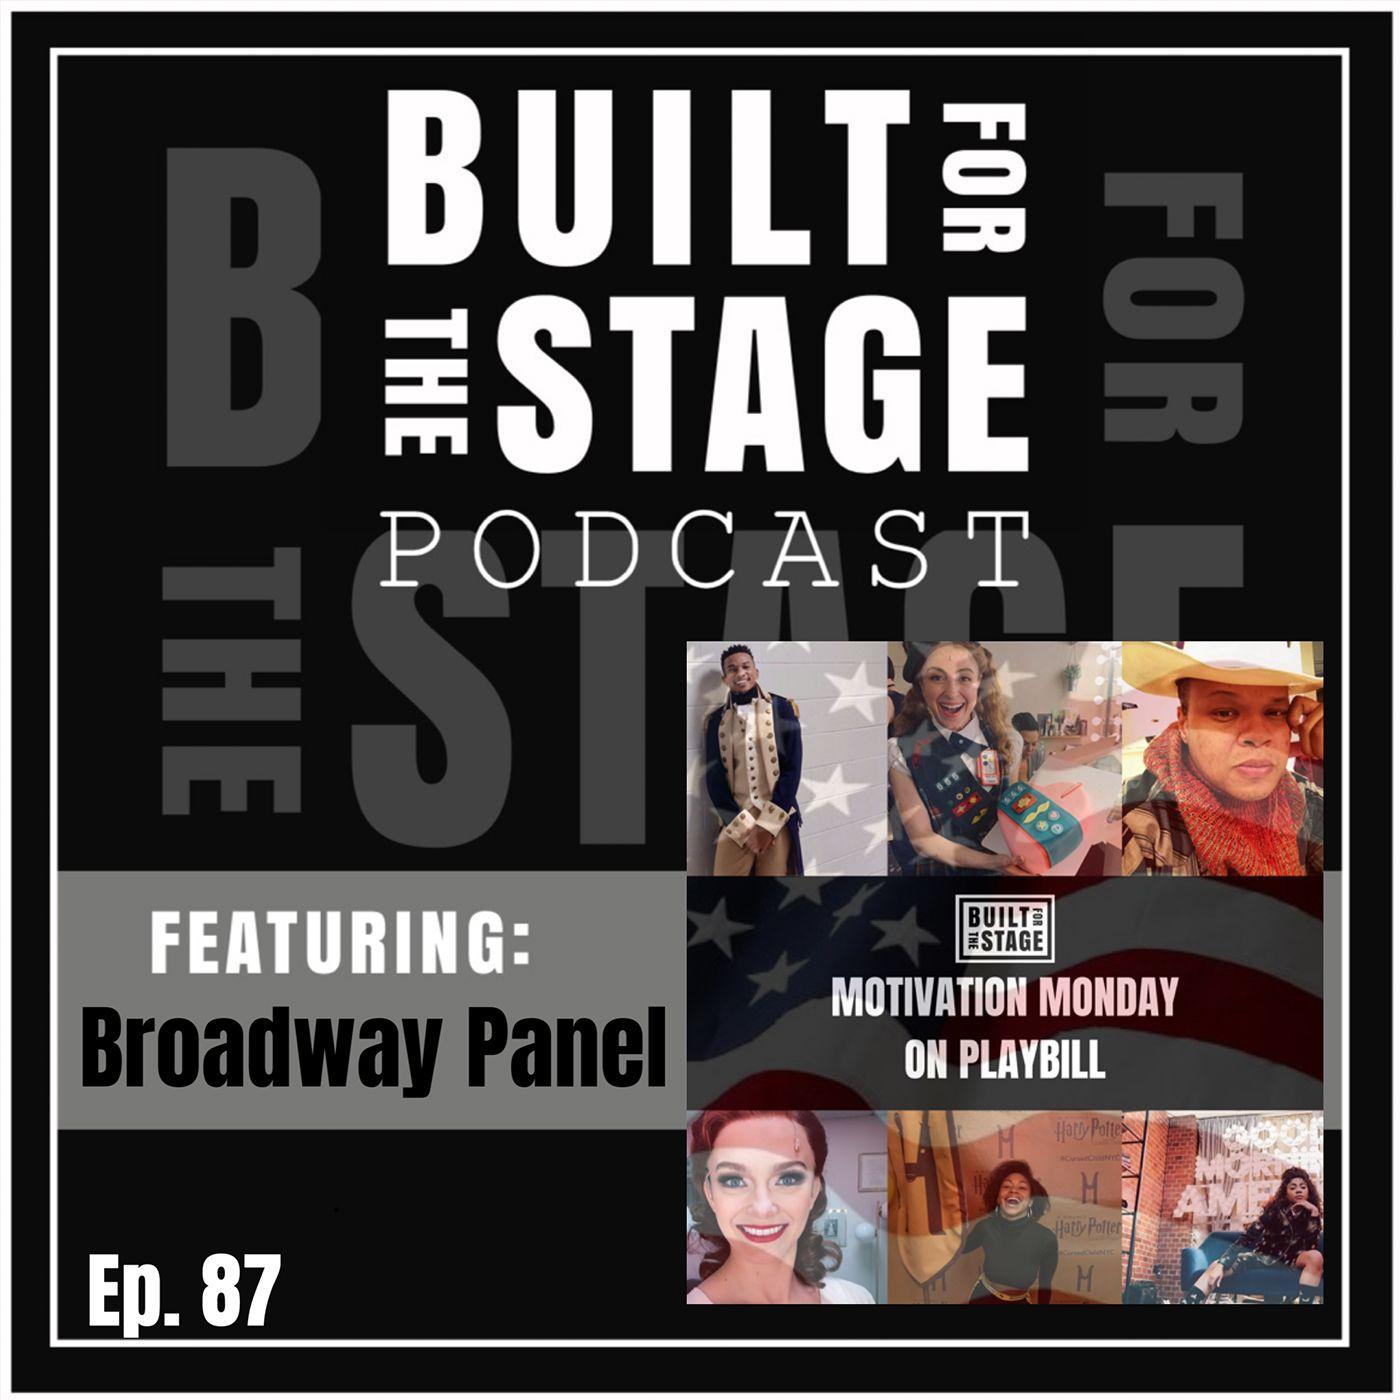 #87 - Broadway Panel - Dana Steingold, Nadia Brown, Gabe Hyman, Jerusha Cavazos, Jennifer Noble, Will Mann, Mo Brady